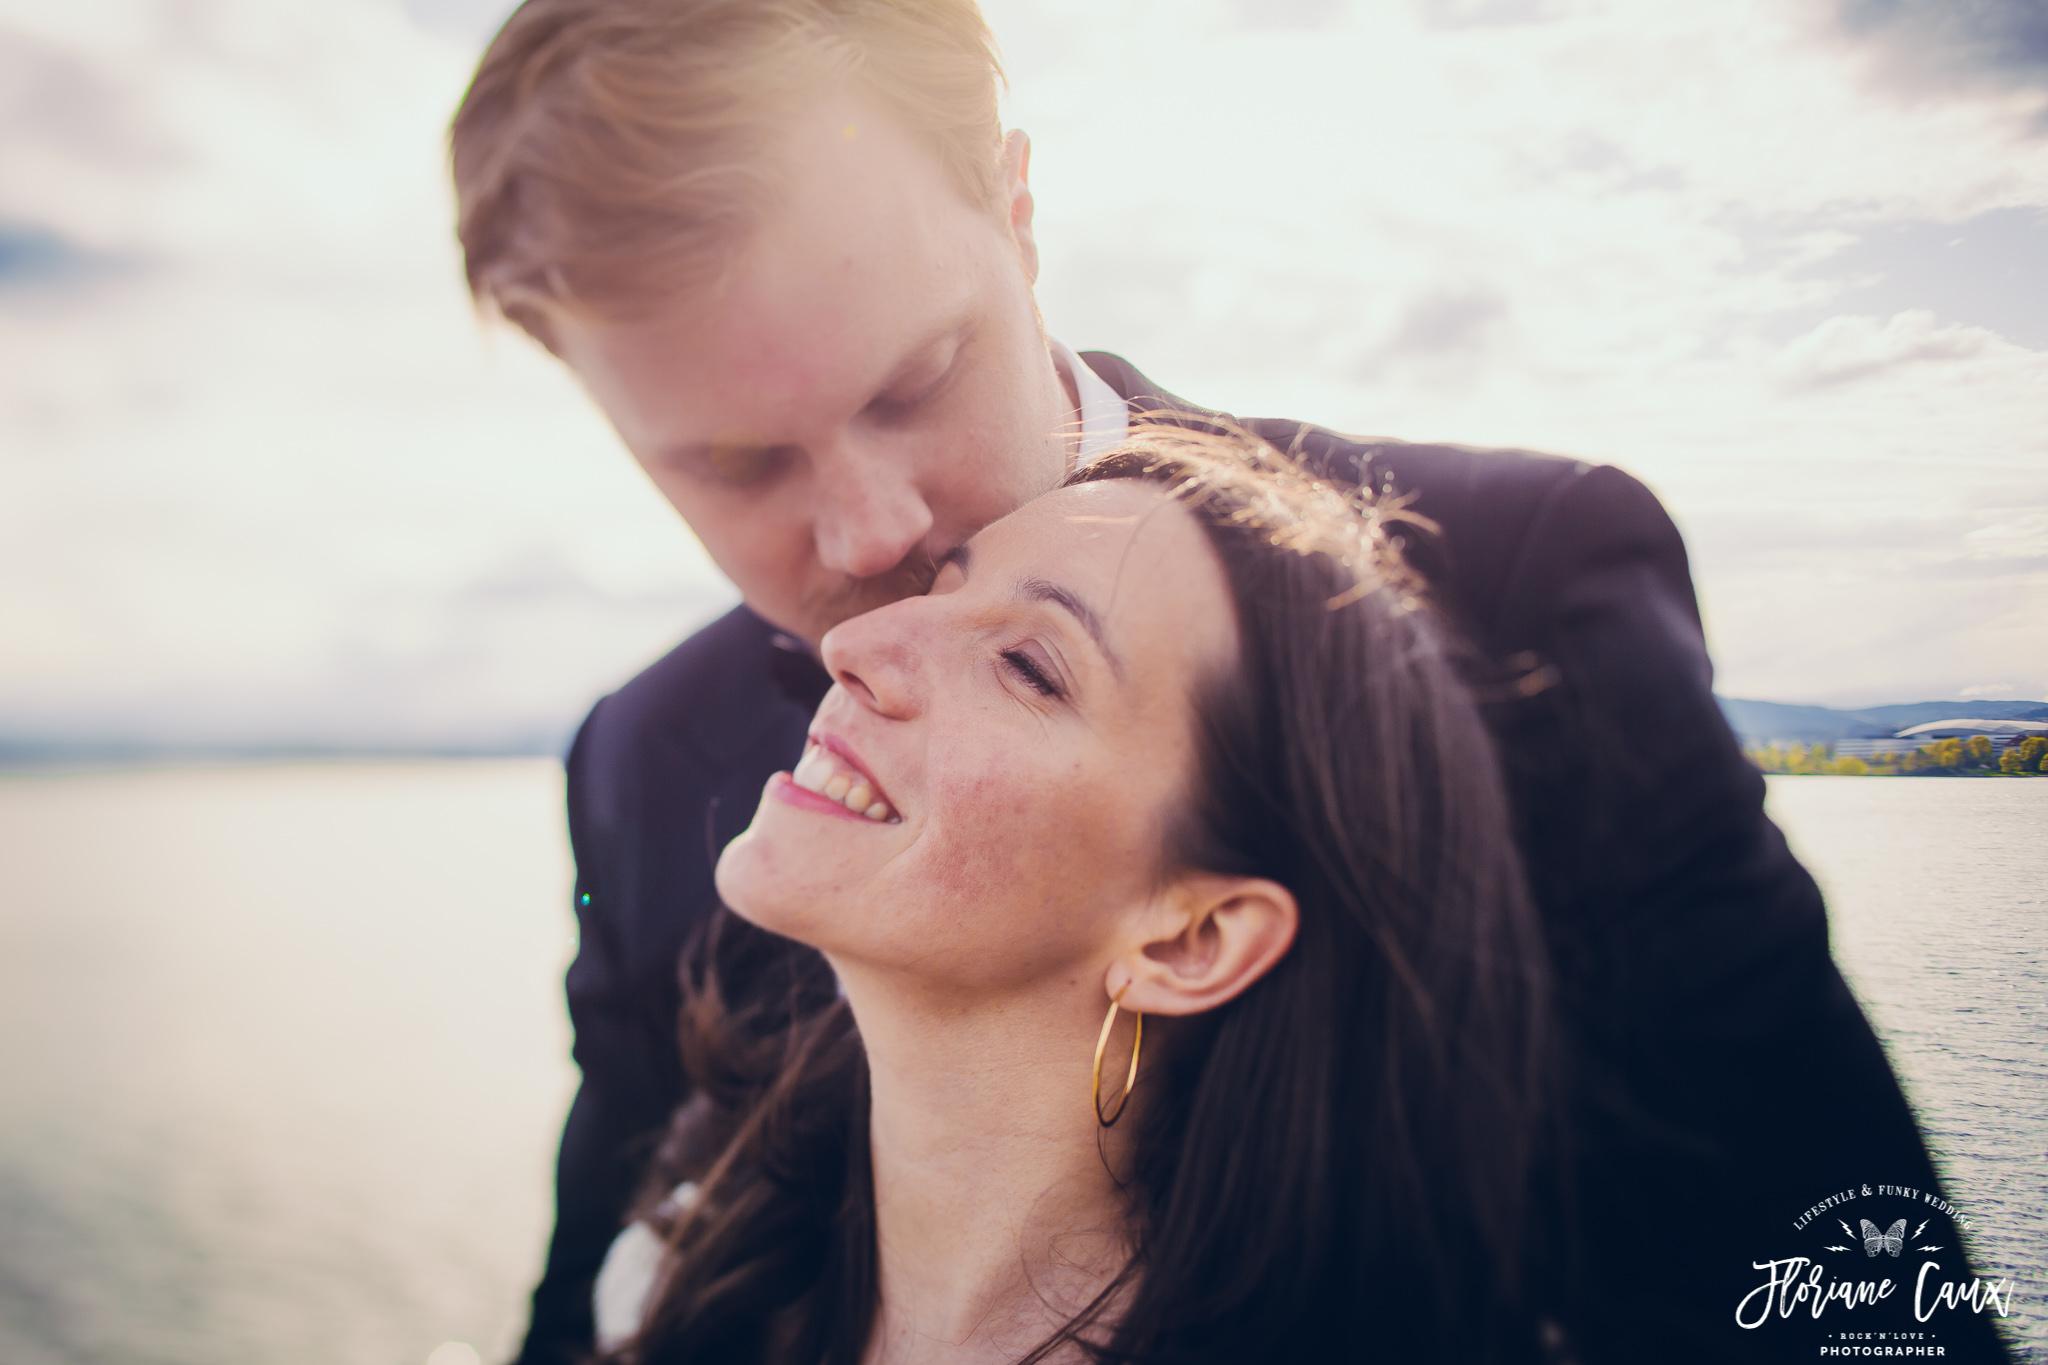 destination-wedding-photographer-oslo-norway-floriane-caux-73